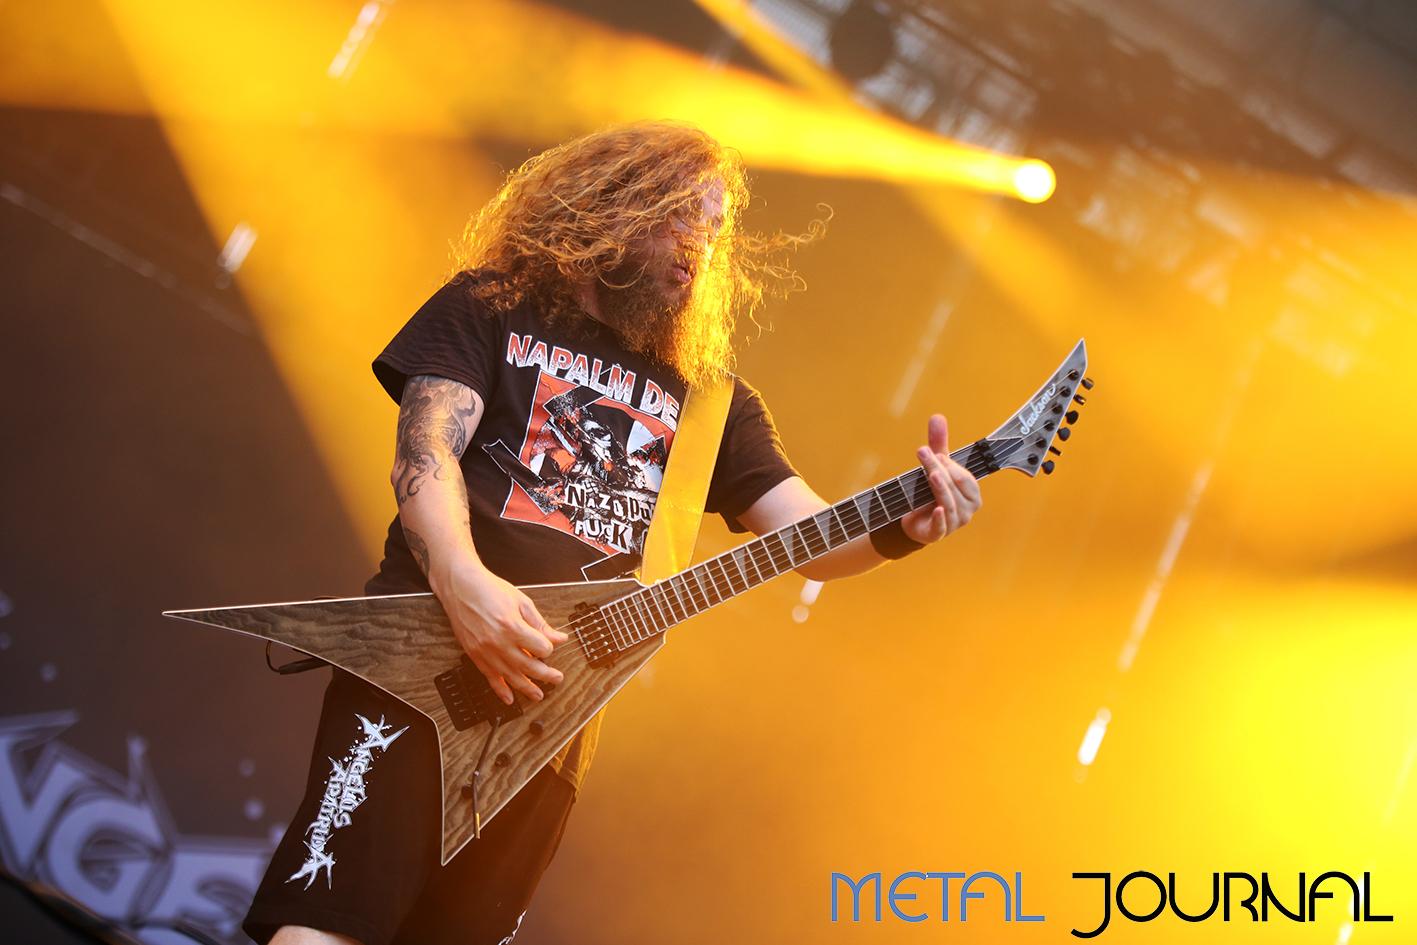 angelus apatrida - metal journal rock fest barcelona 2019 pic 1